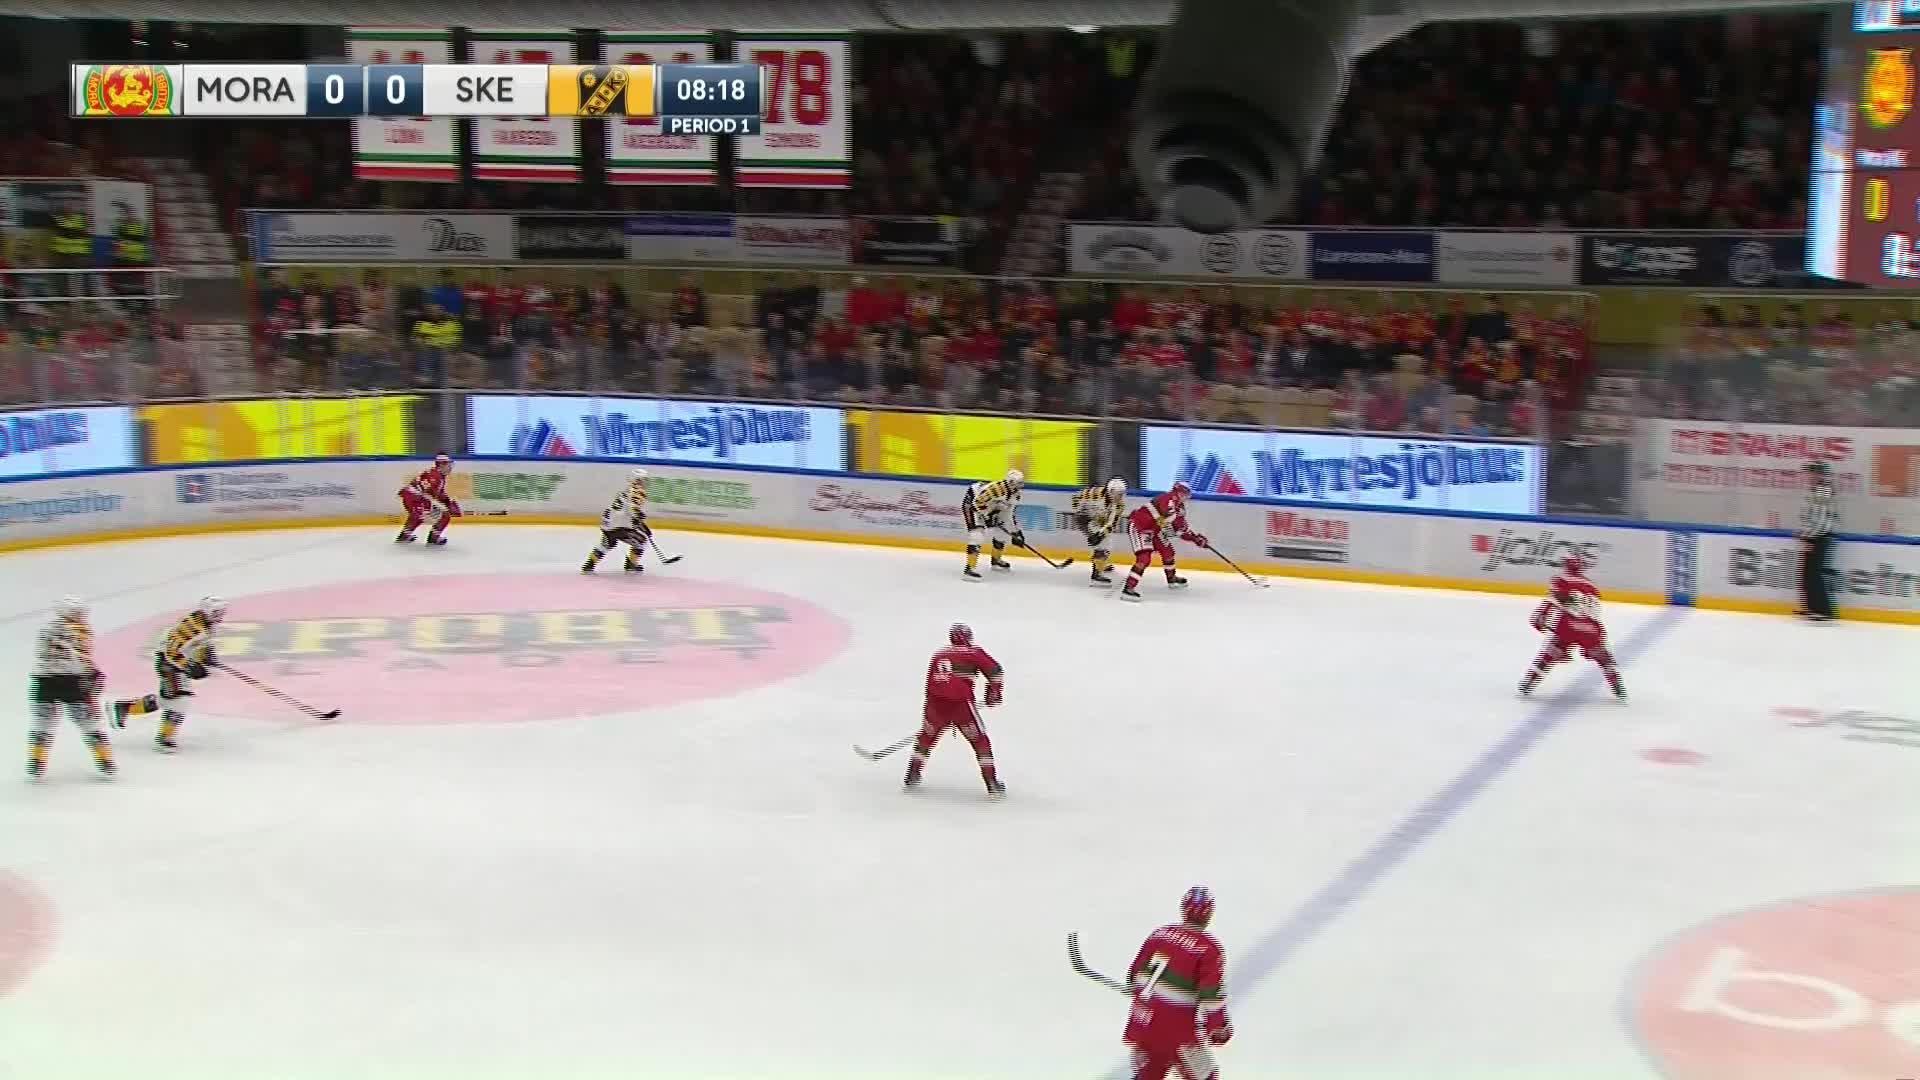 Mora IK - Skellefteå AIK 1-0